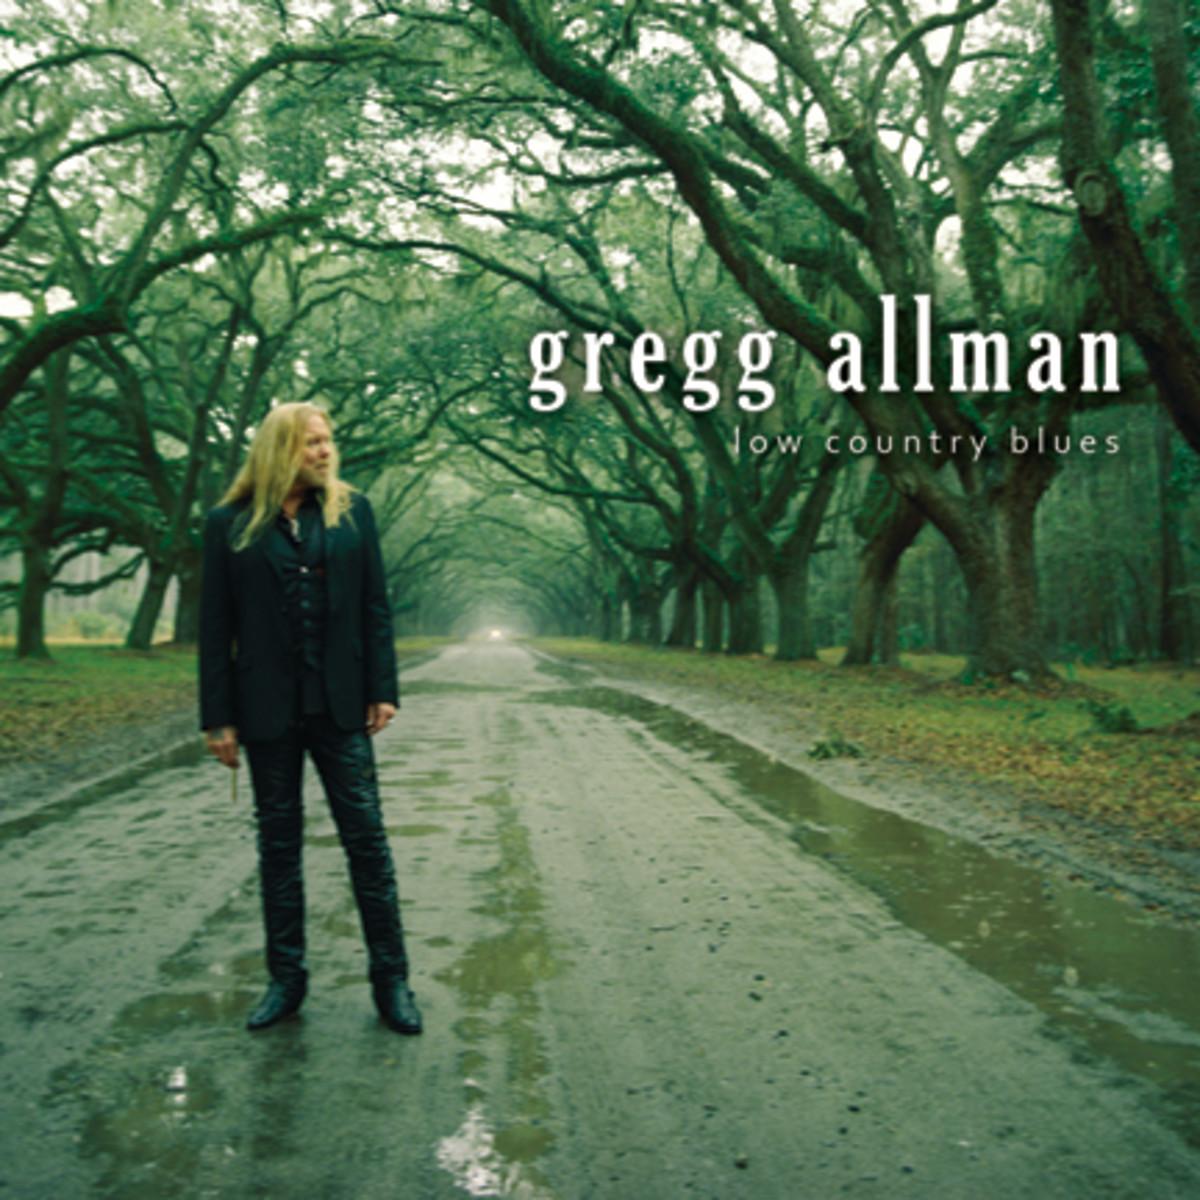 Gregg Allman Low Country Blues album